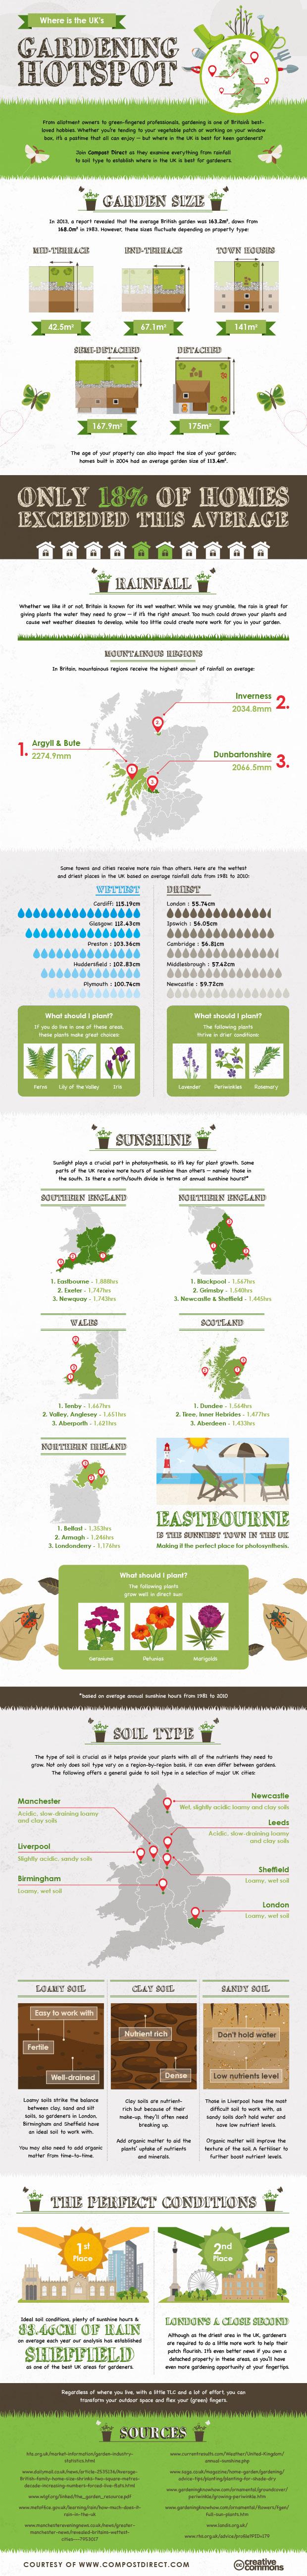 gardening hotspots infographic